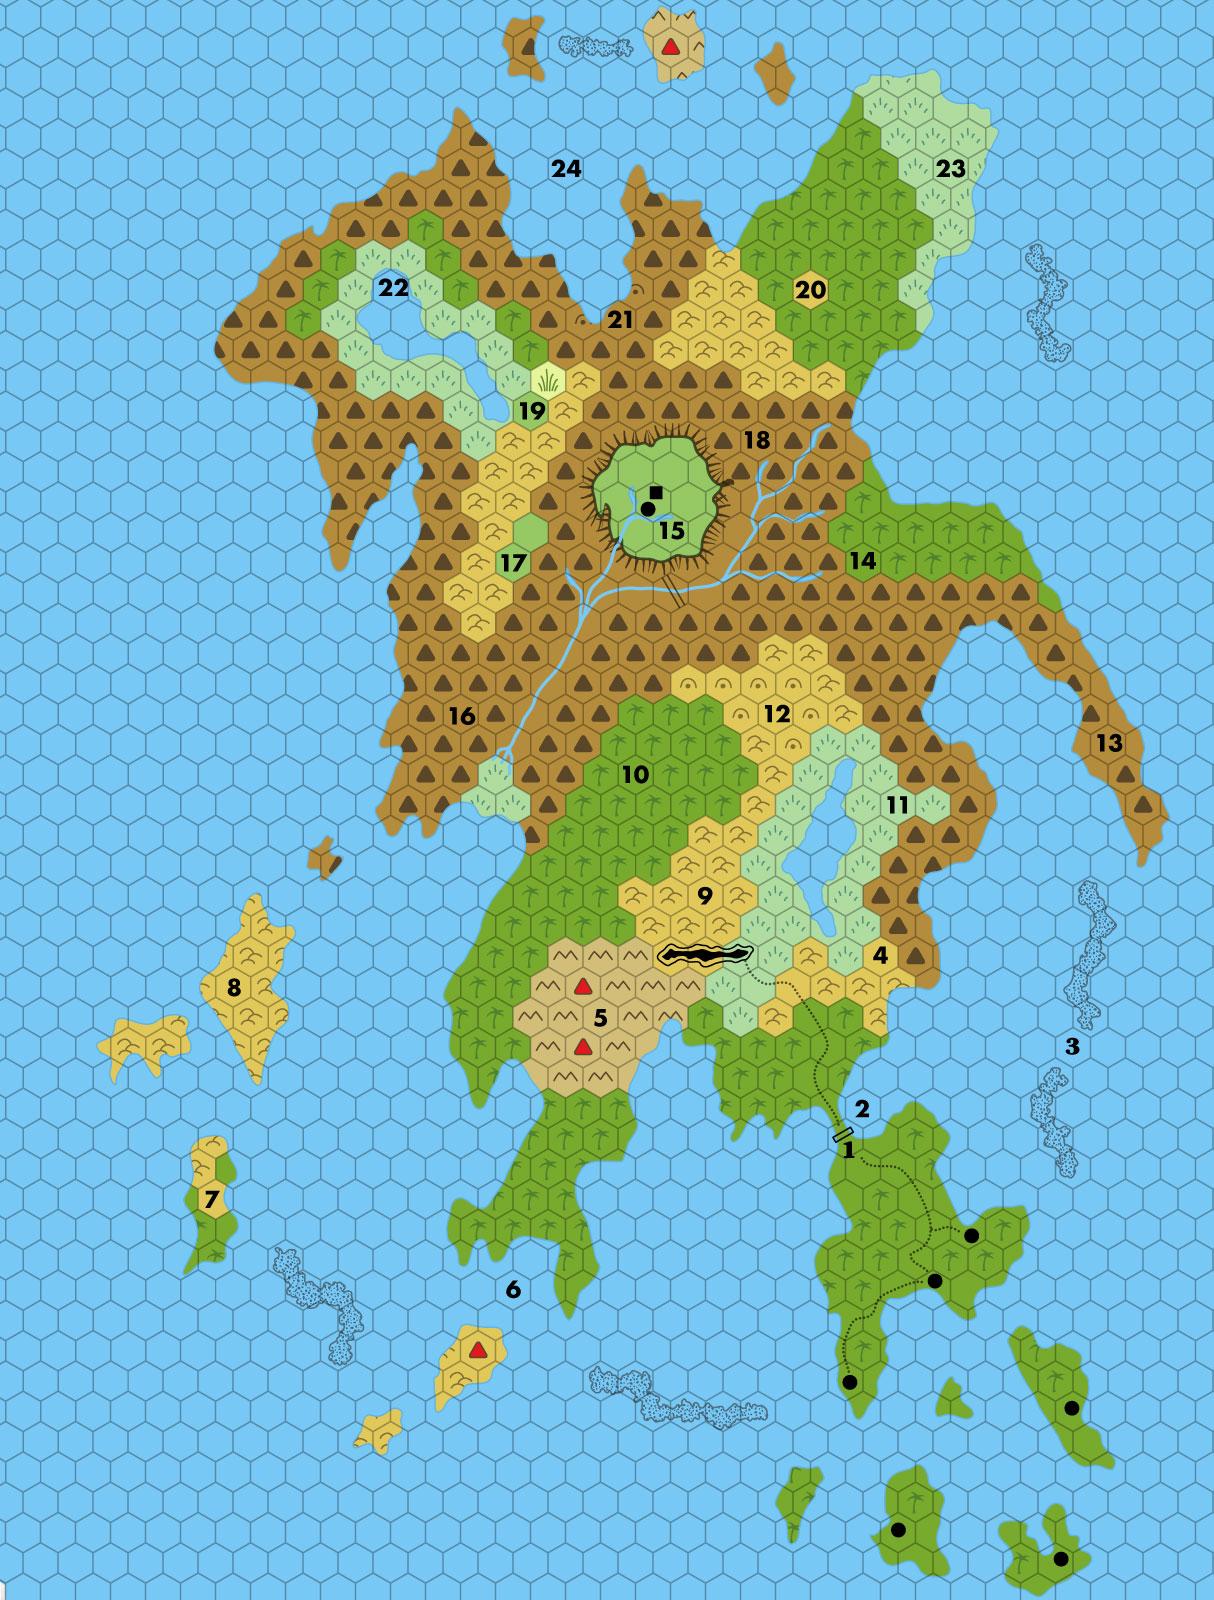 Let's Map Mystara 1981 II